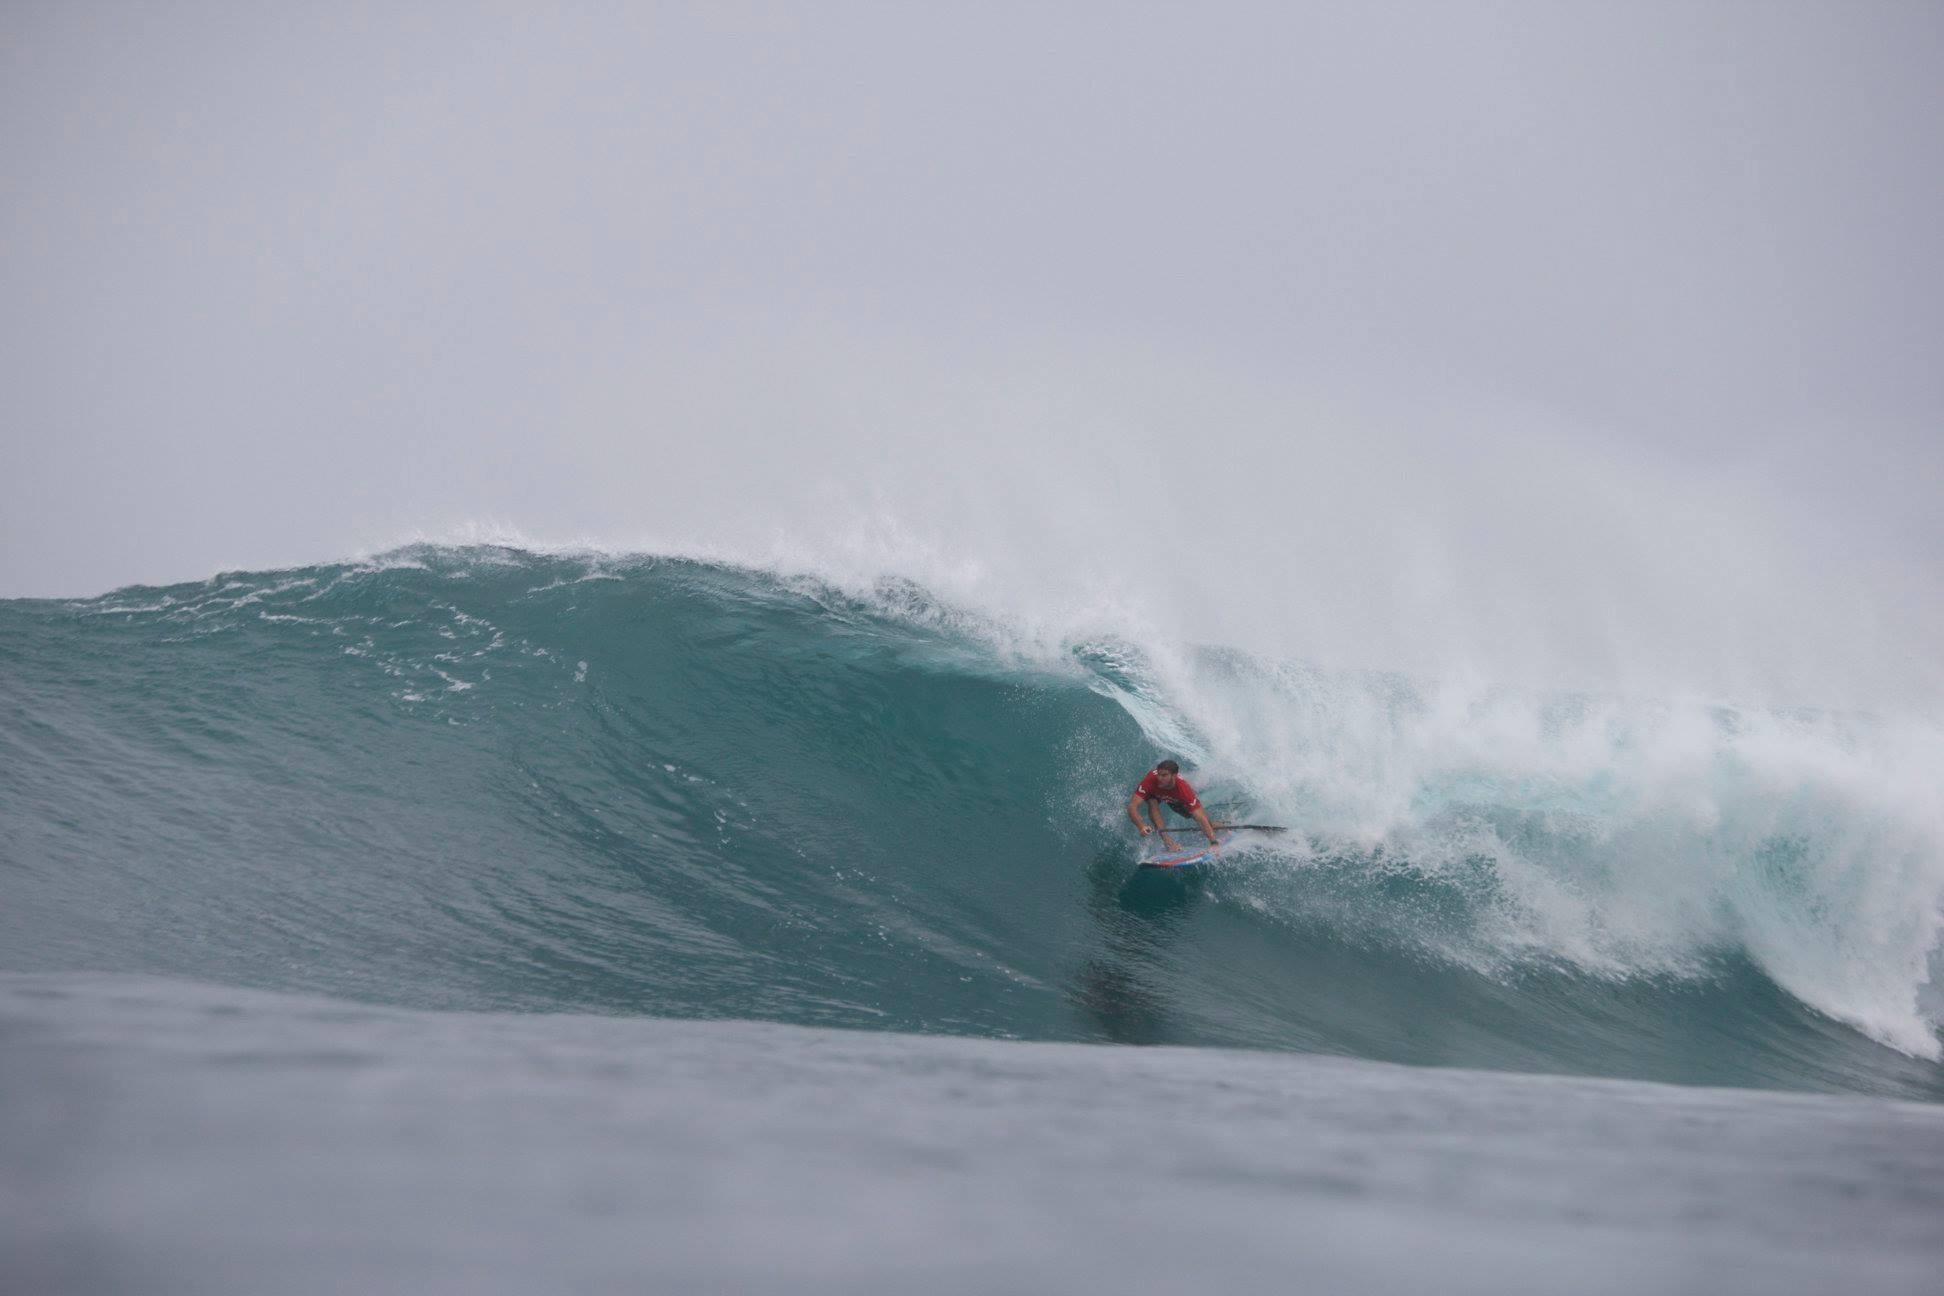 Starboard-Stand-Up-Paddleboarding-SUP-Surf-Zane's-2019-Sunset-Beach-Pro-Recap-Deep-Barrel-1